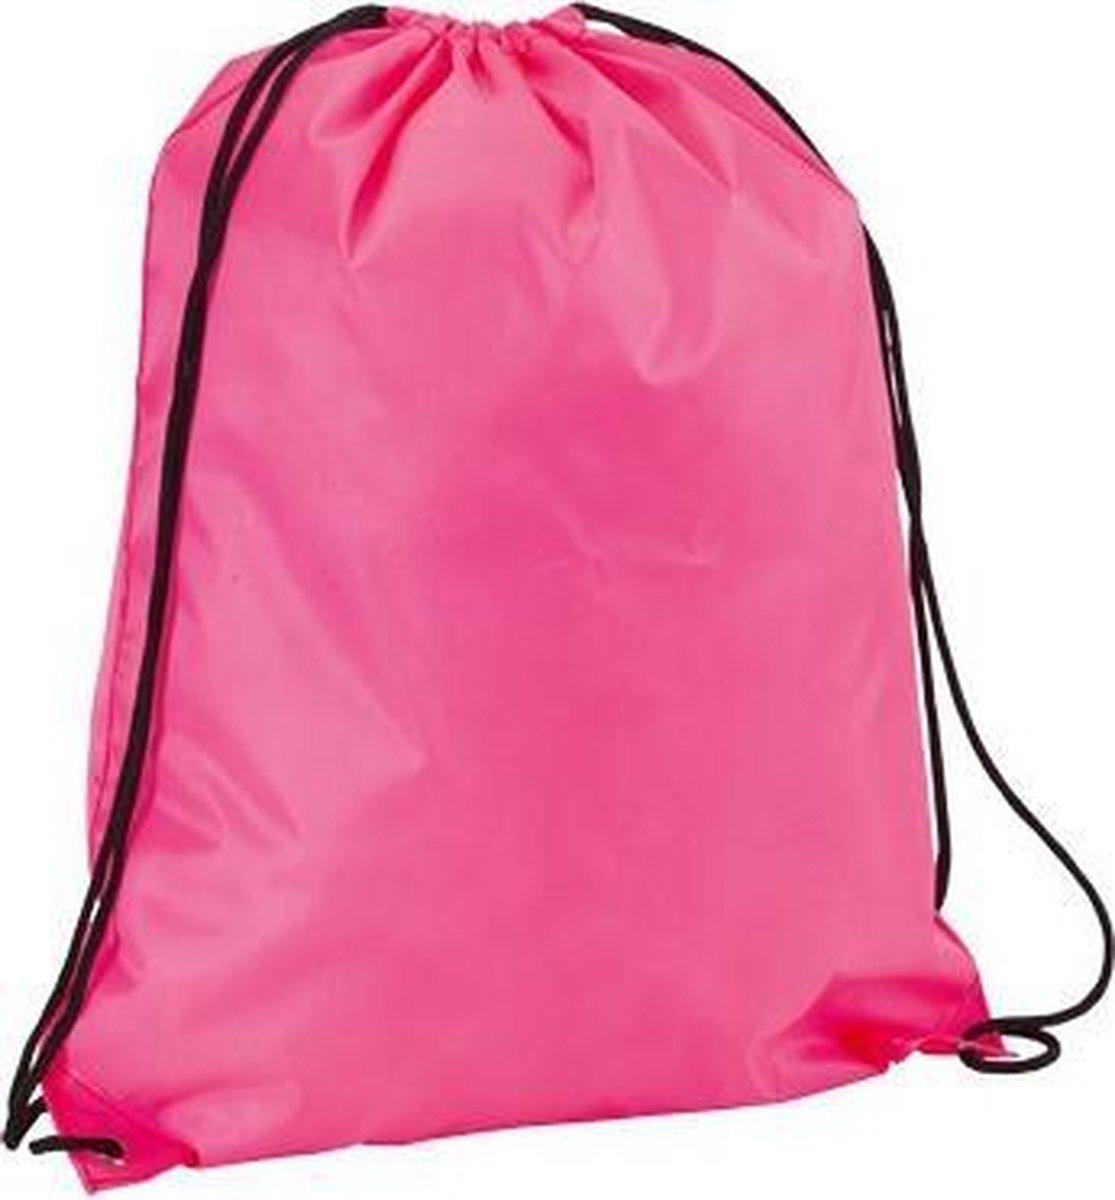 Neon roze gymtas met rijgkoord - Merkloos